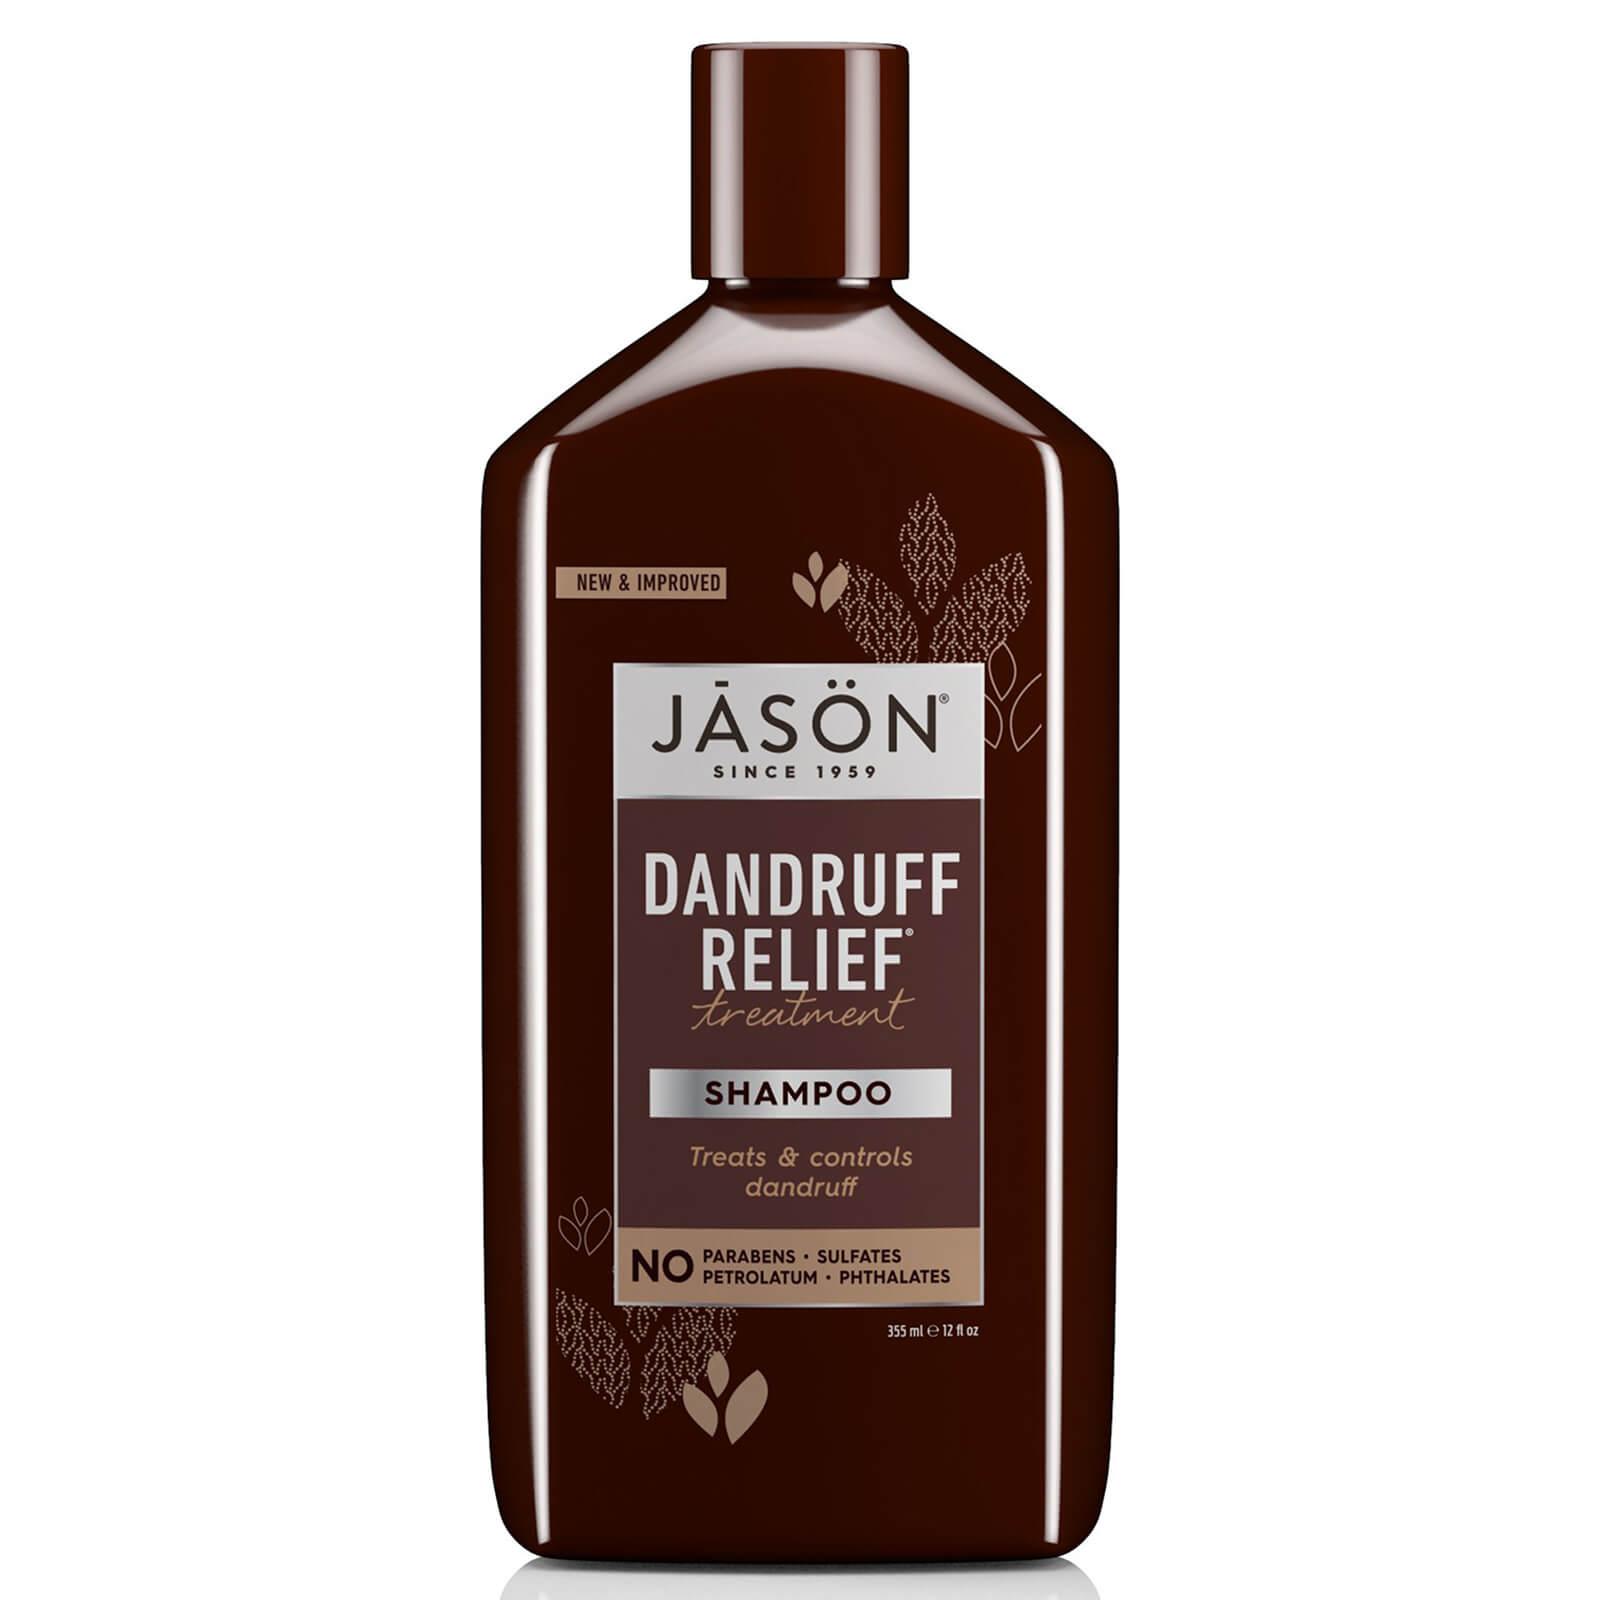 JASON Dandruff Relief Treatment Shampoo 355ml - £7.34 delivered @ Mankind